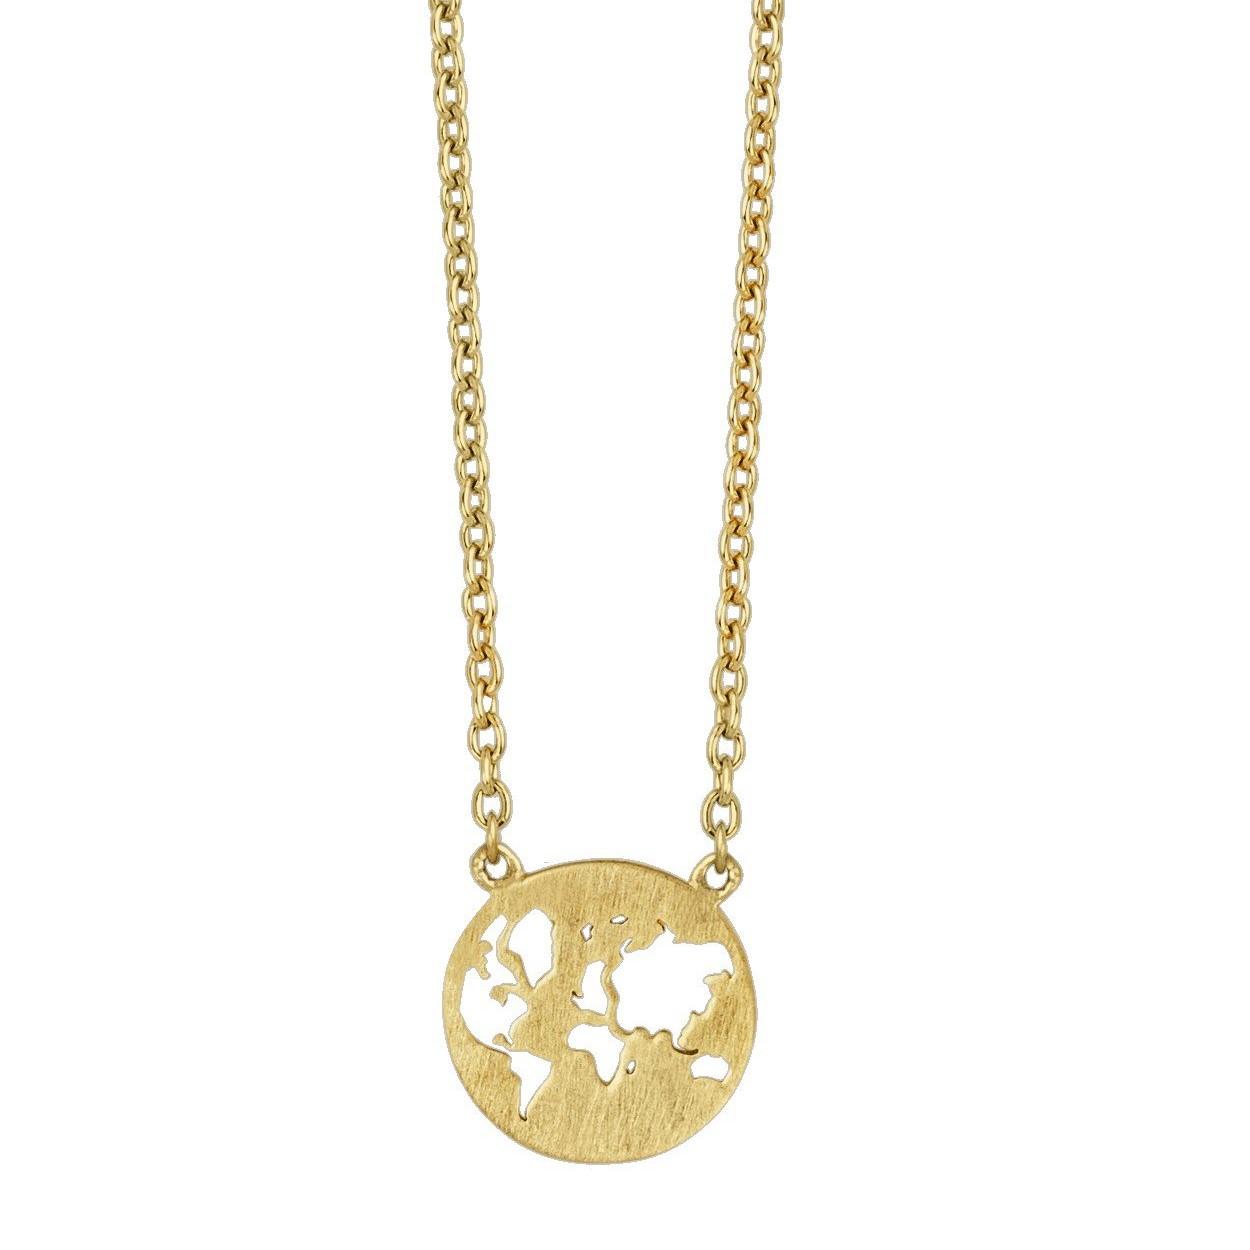 Hypermoderne BEAUTIFUL WORLD halskæde- Solid Guld - Ure-smykker din lokale PV-09